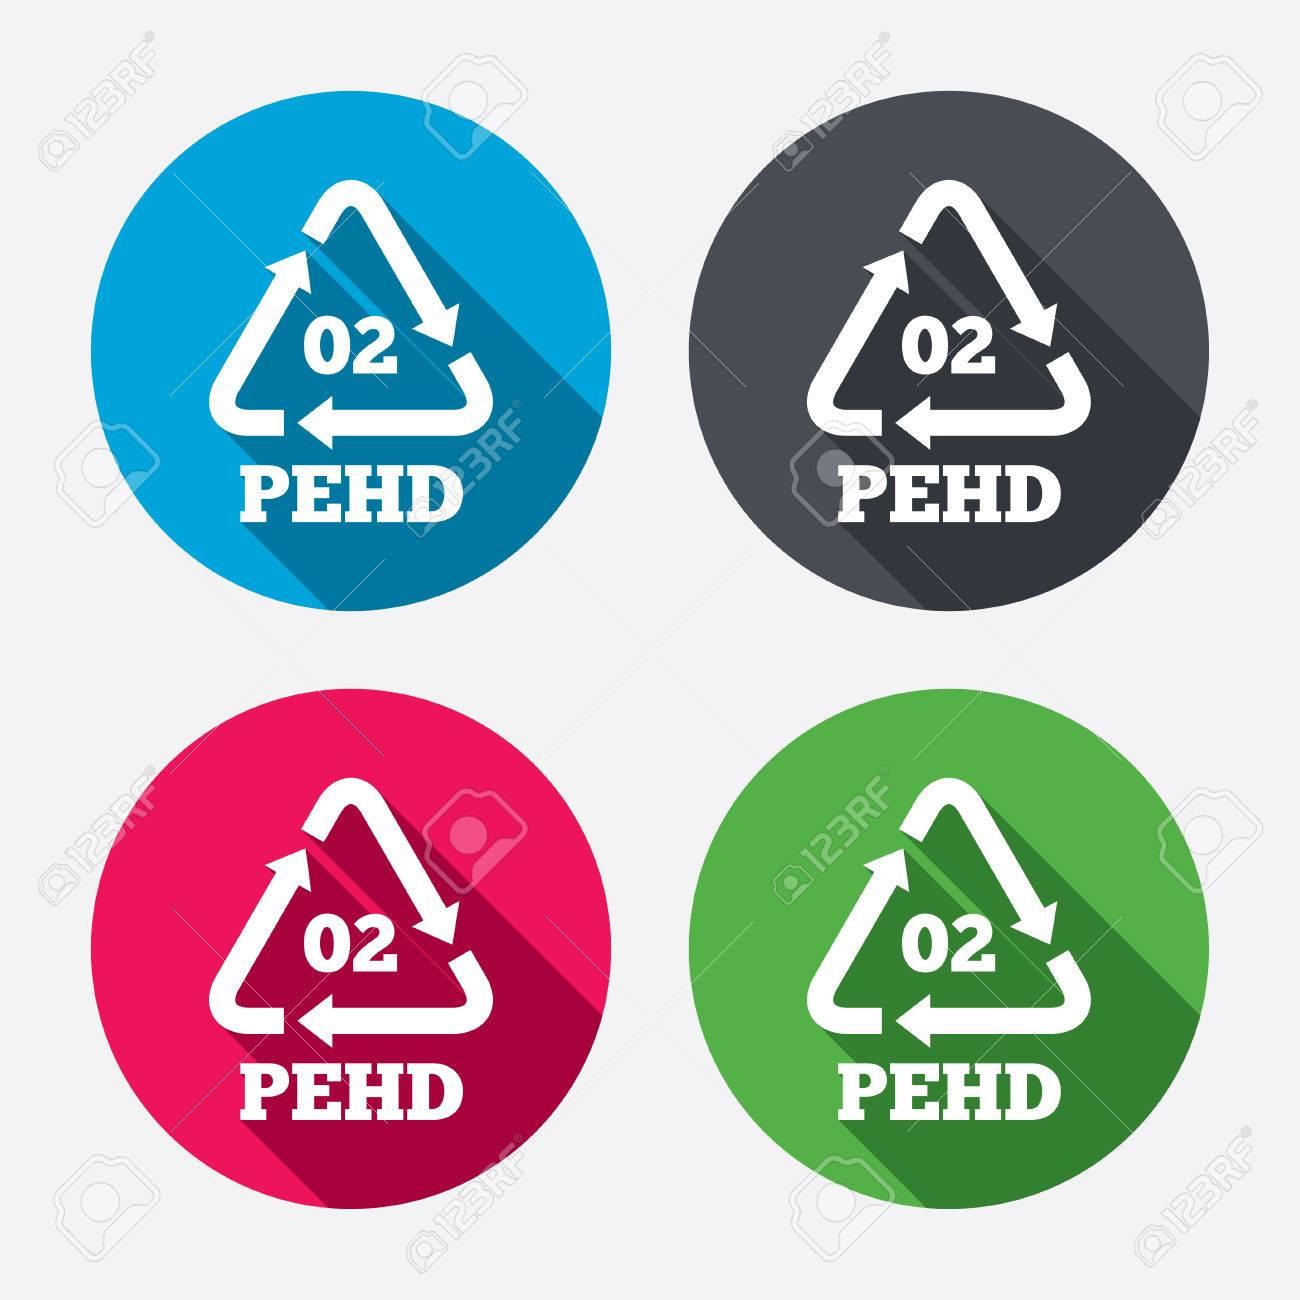 Hd pe 02 icon high density polyethylene sign recycling symbol hd pe 02 icon high density polyethylene sign recycling symbol circle biocorpaavc Choice Image